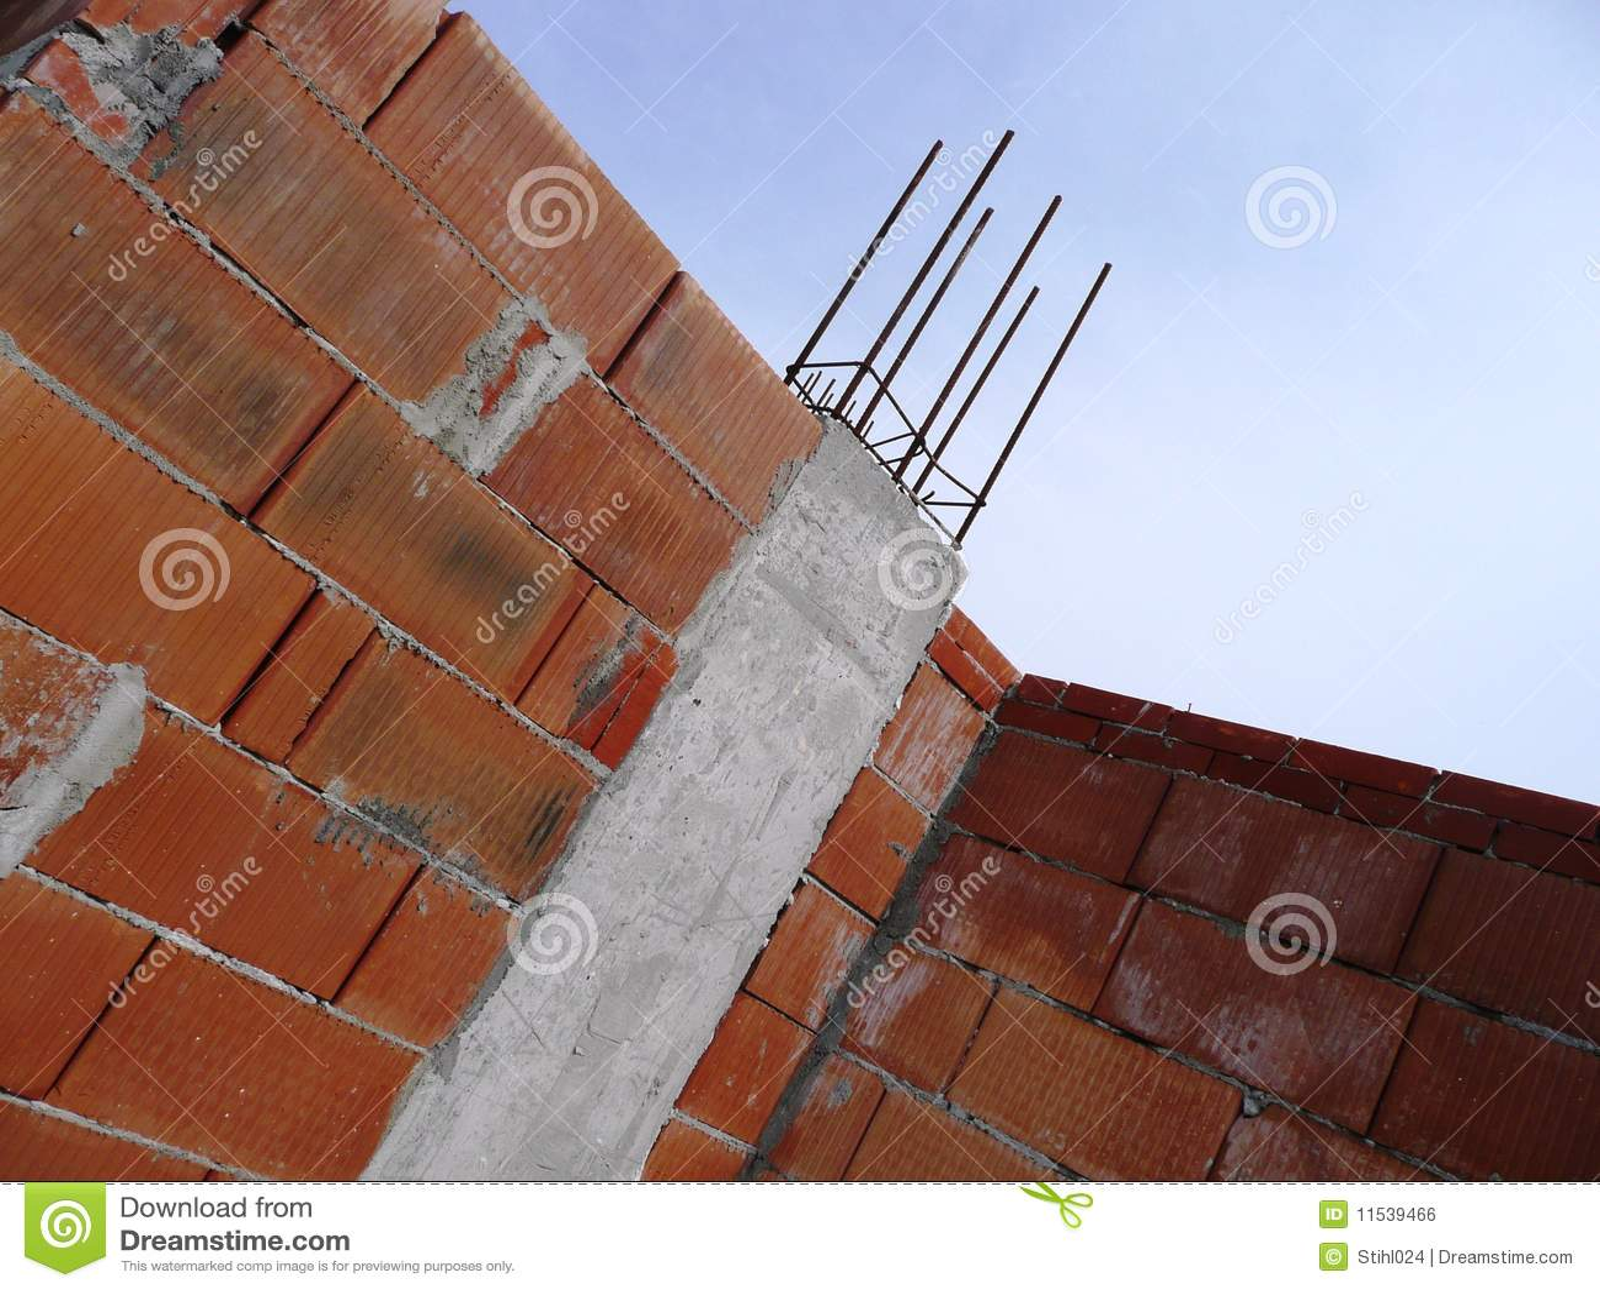 concrete construction site with